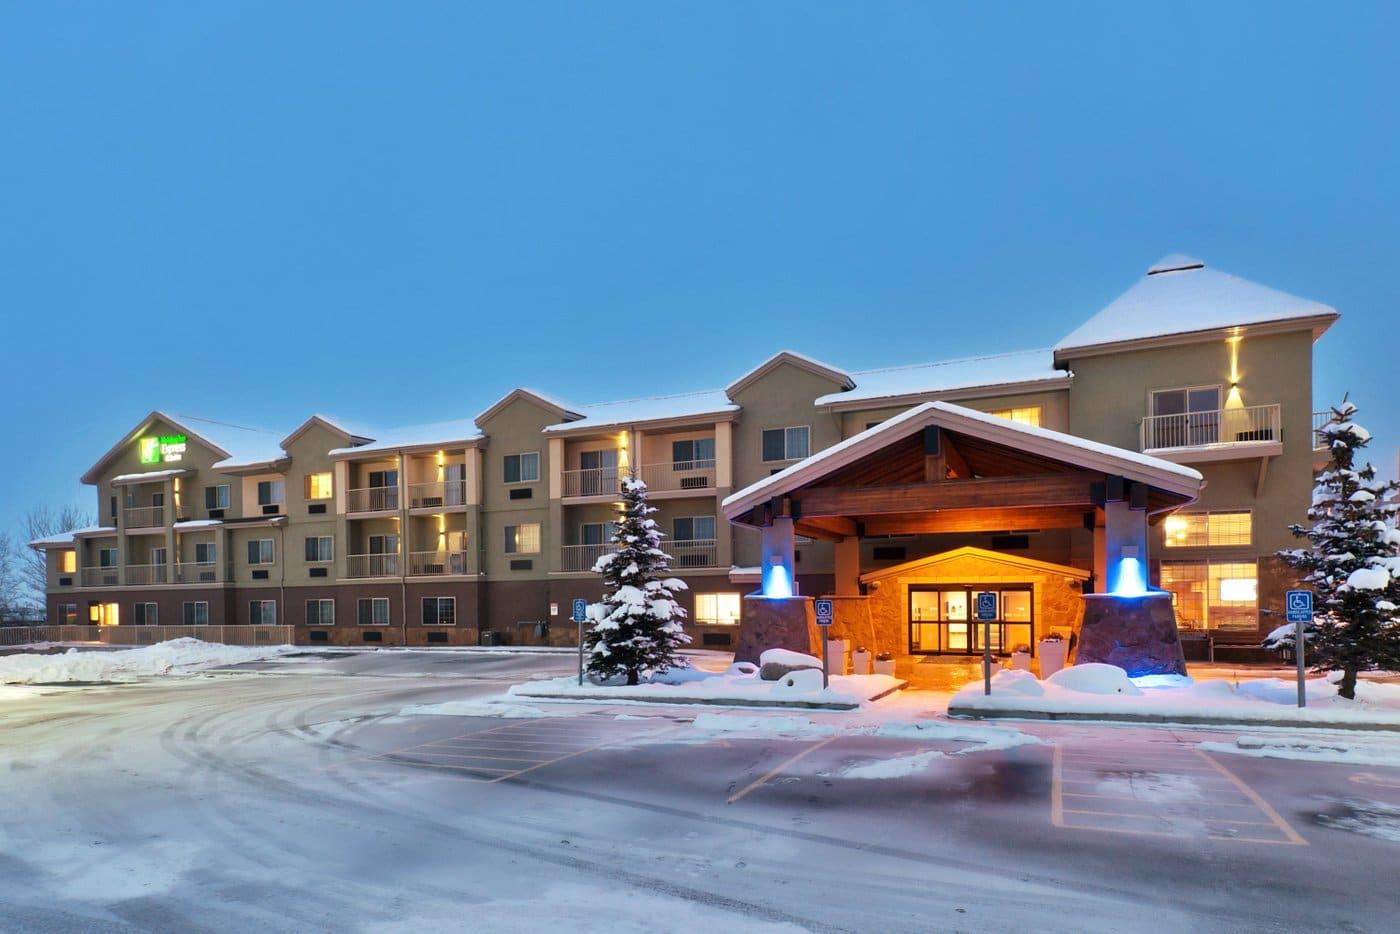 image of holiday inn